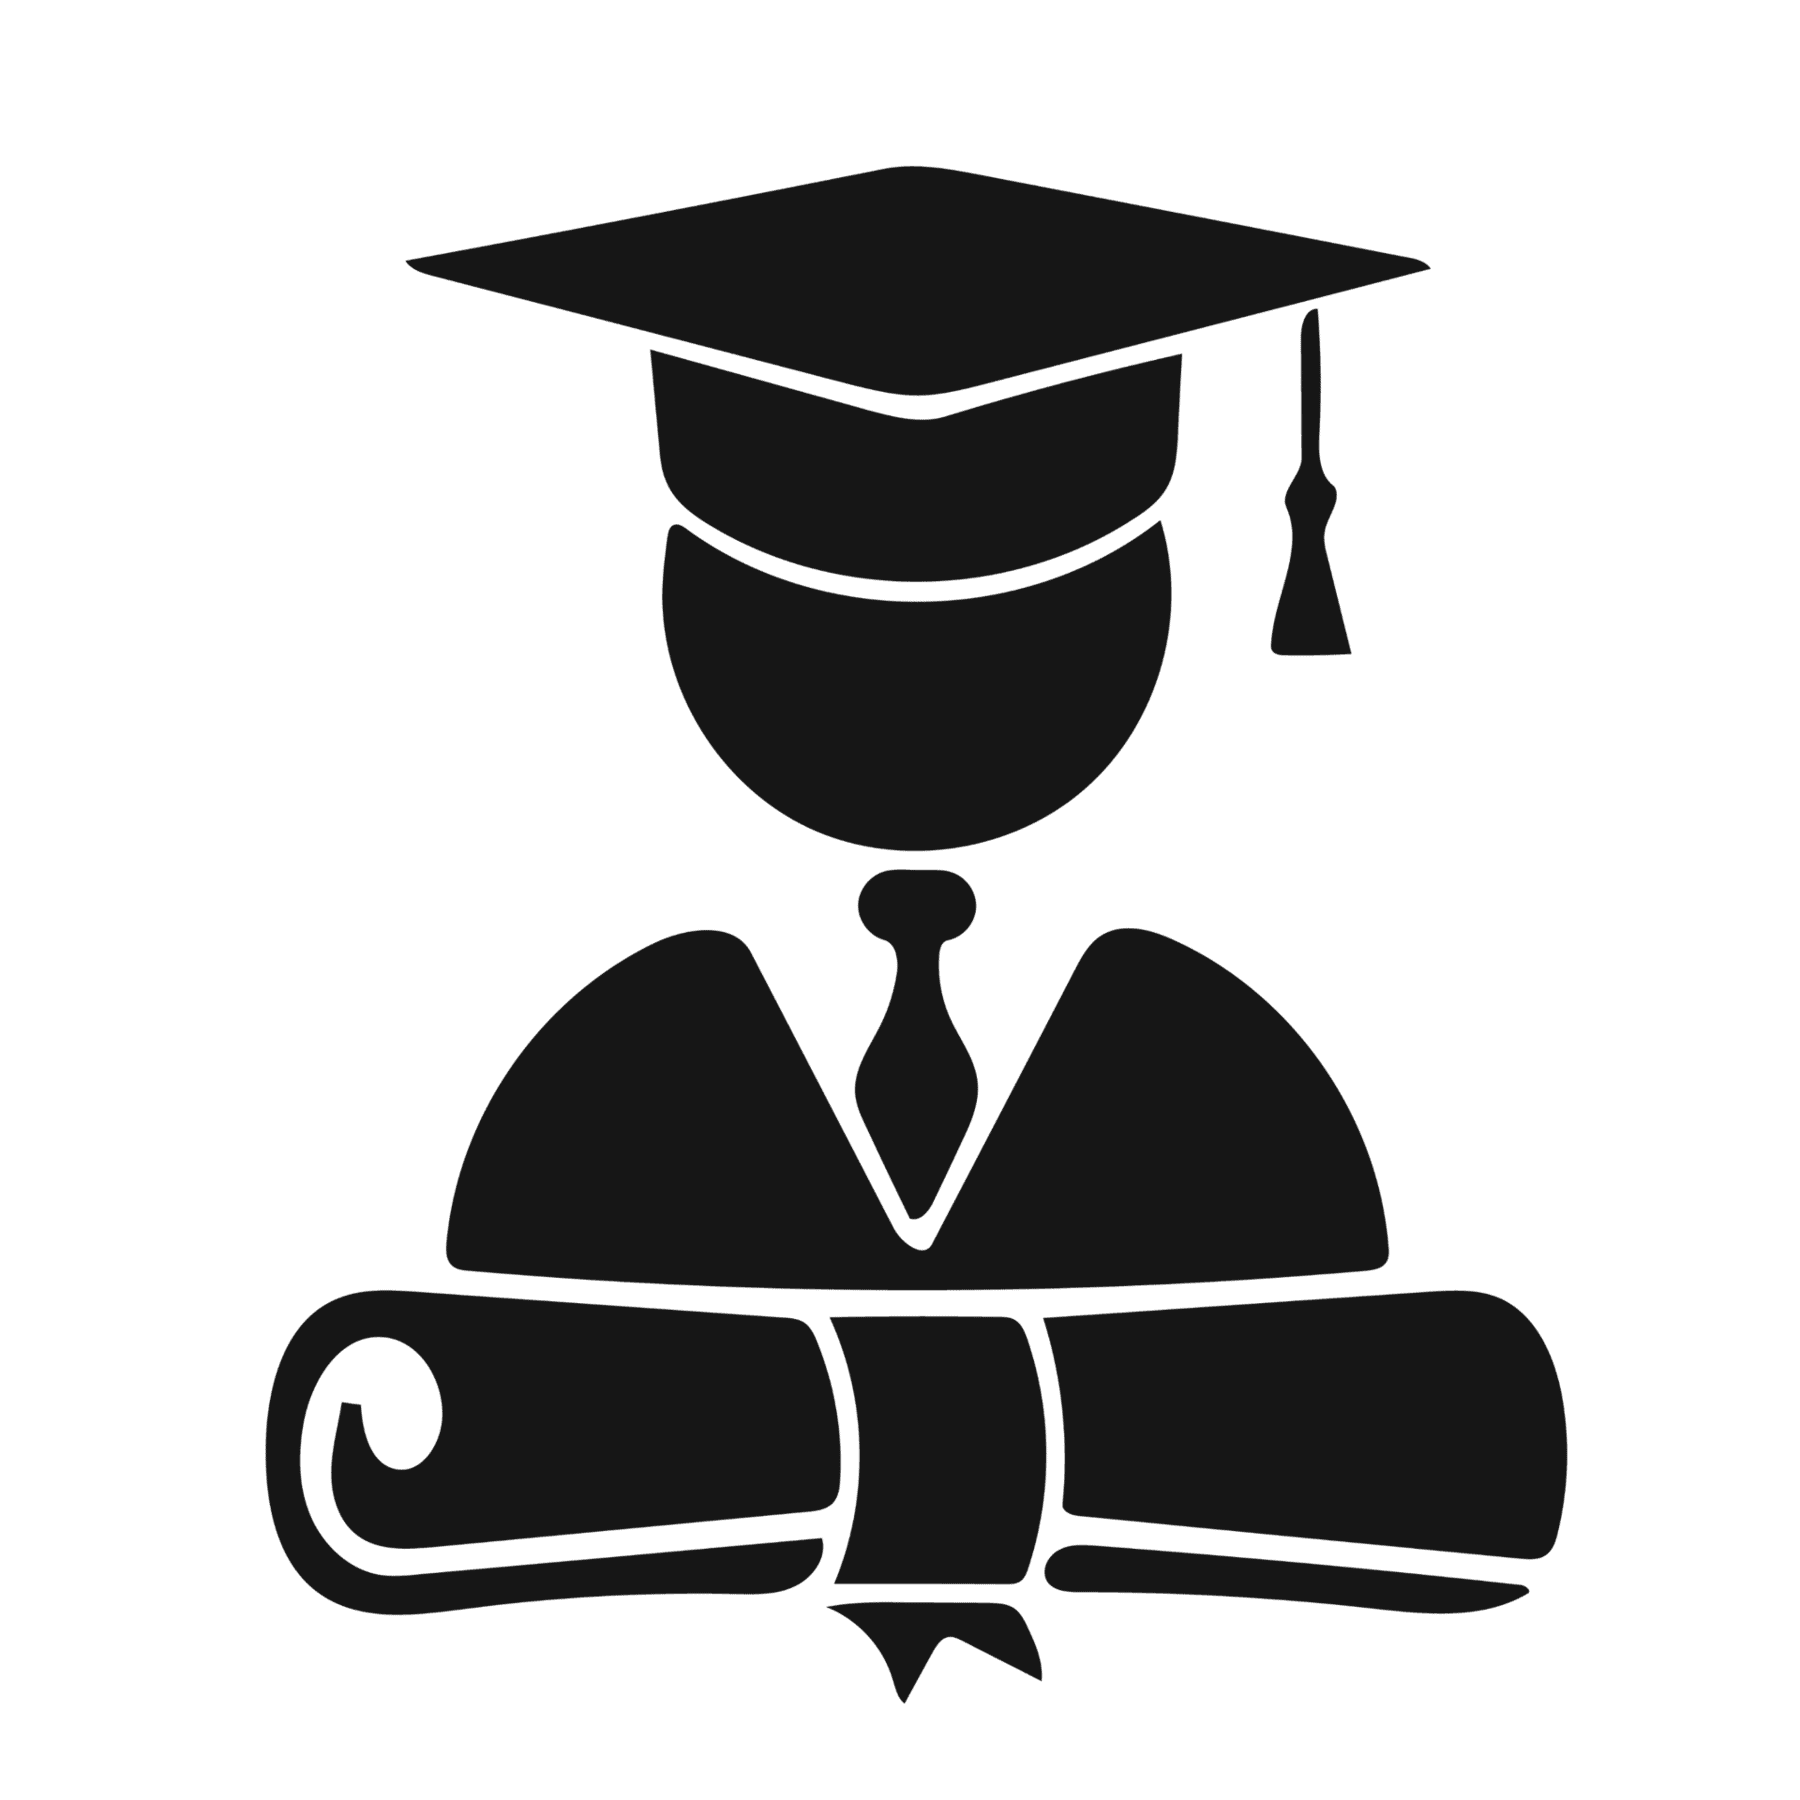 iconic image to represent study